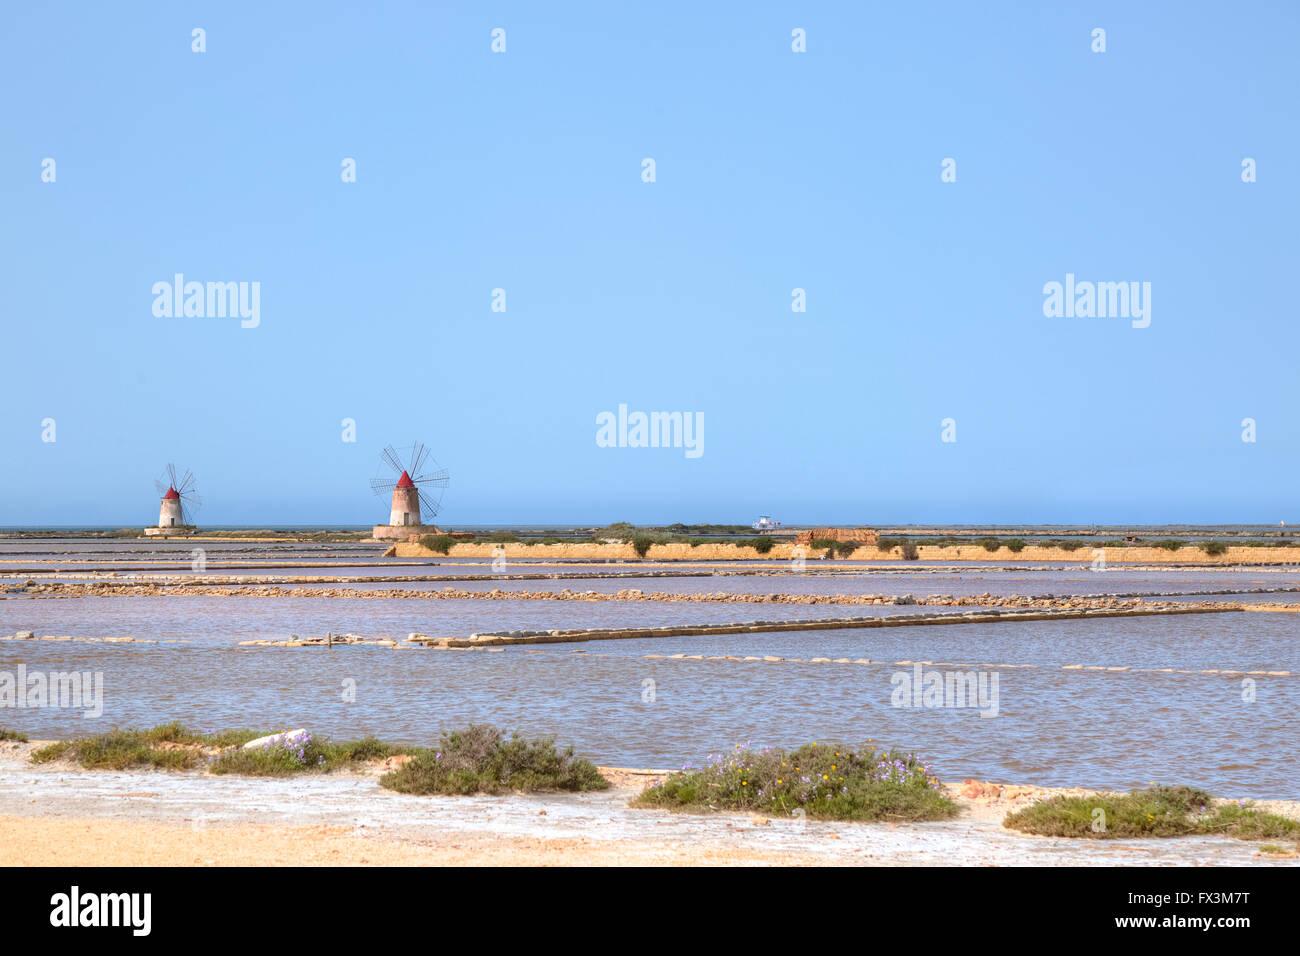 Salt Mills, Marsala, Mozia, Sicily, Italy - Stock Image